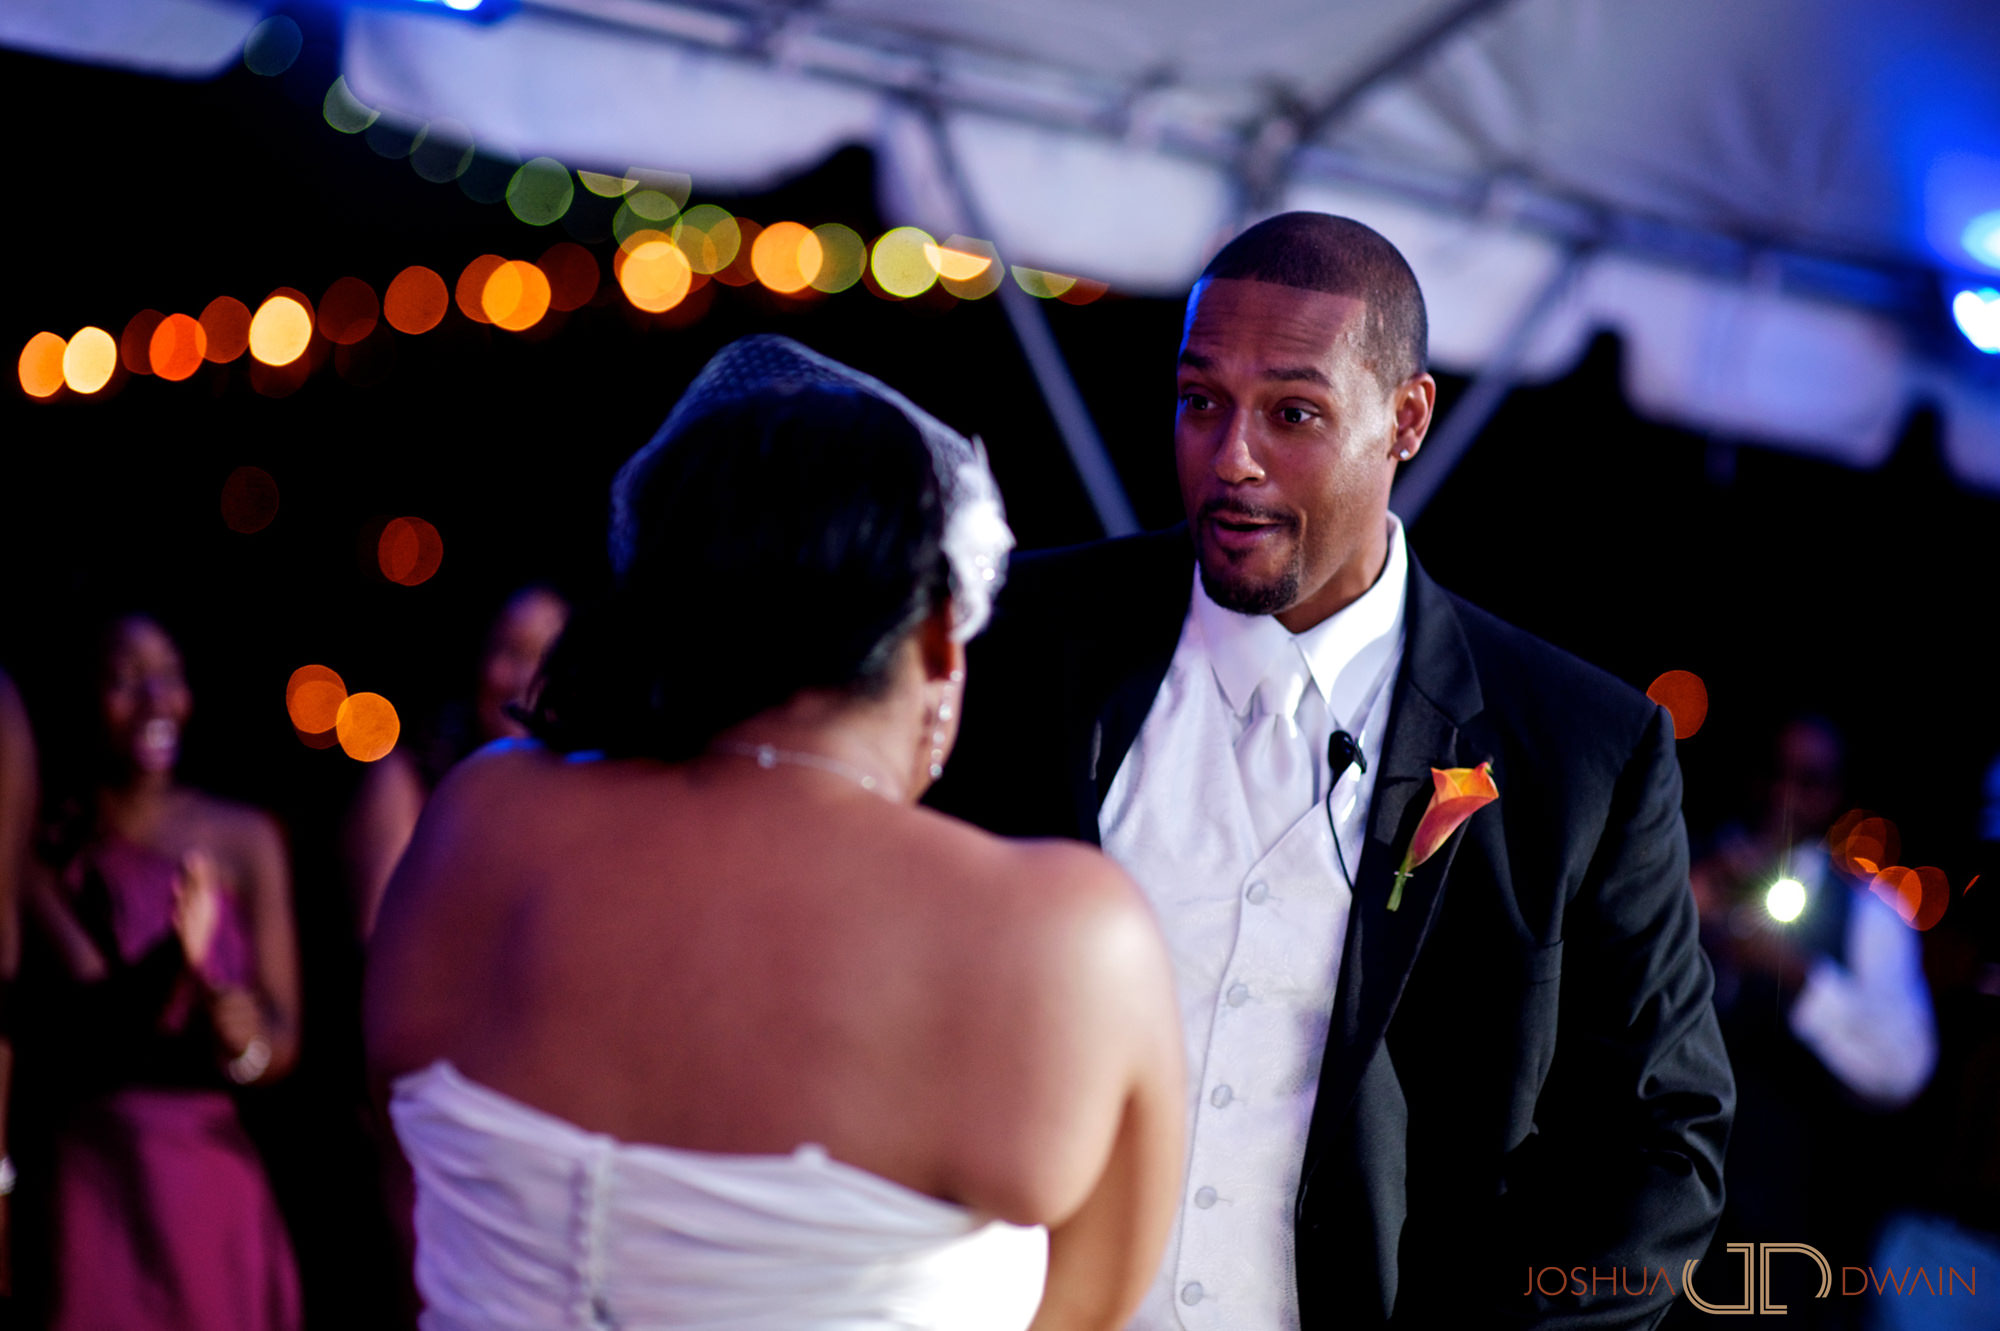 jessica-frank-020-giando-on-the-water-brooklyn-ny-wedding-photographer-joshua-dwain-2011-09-02_jf_468